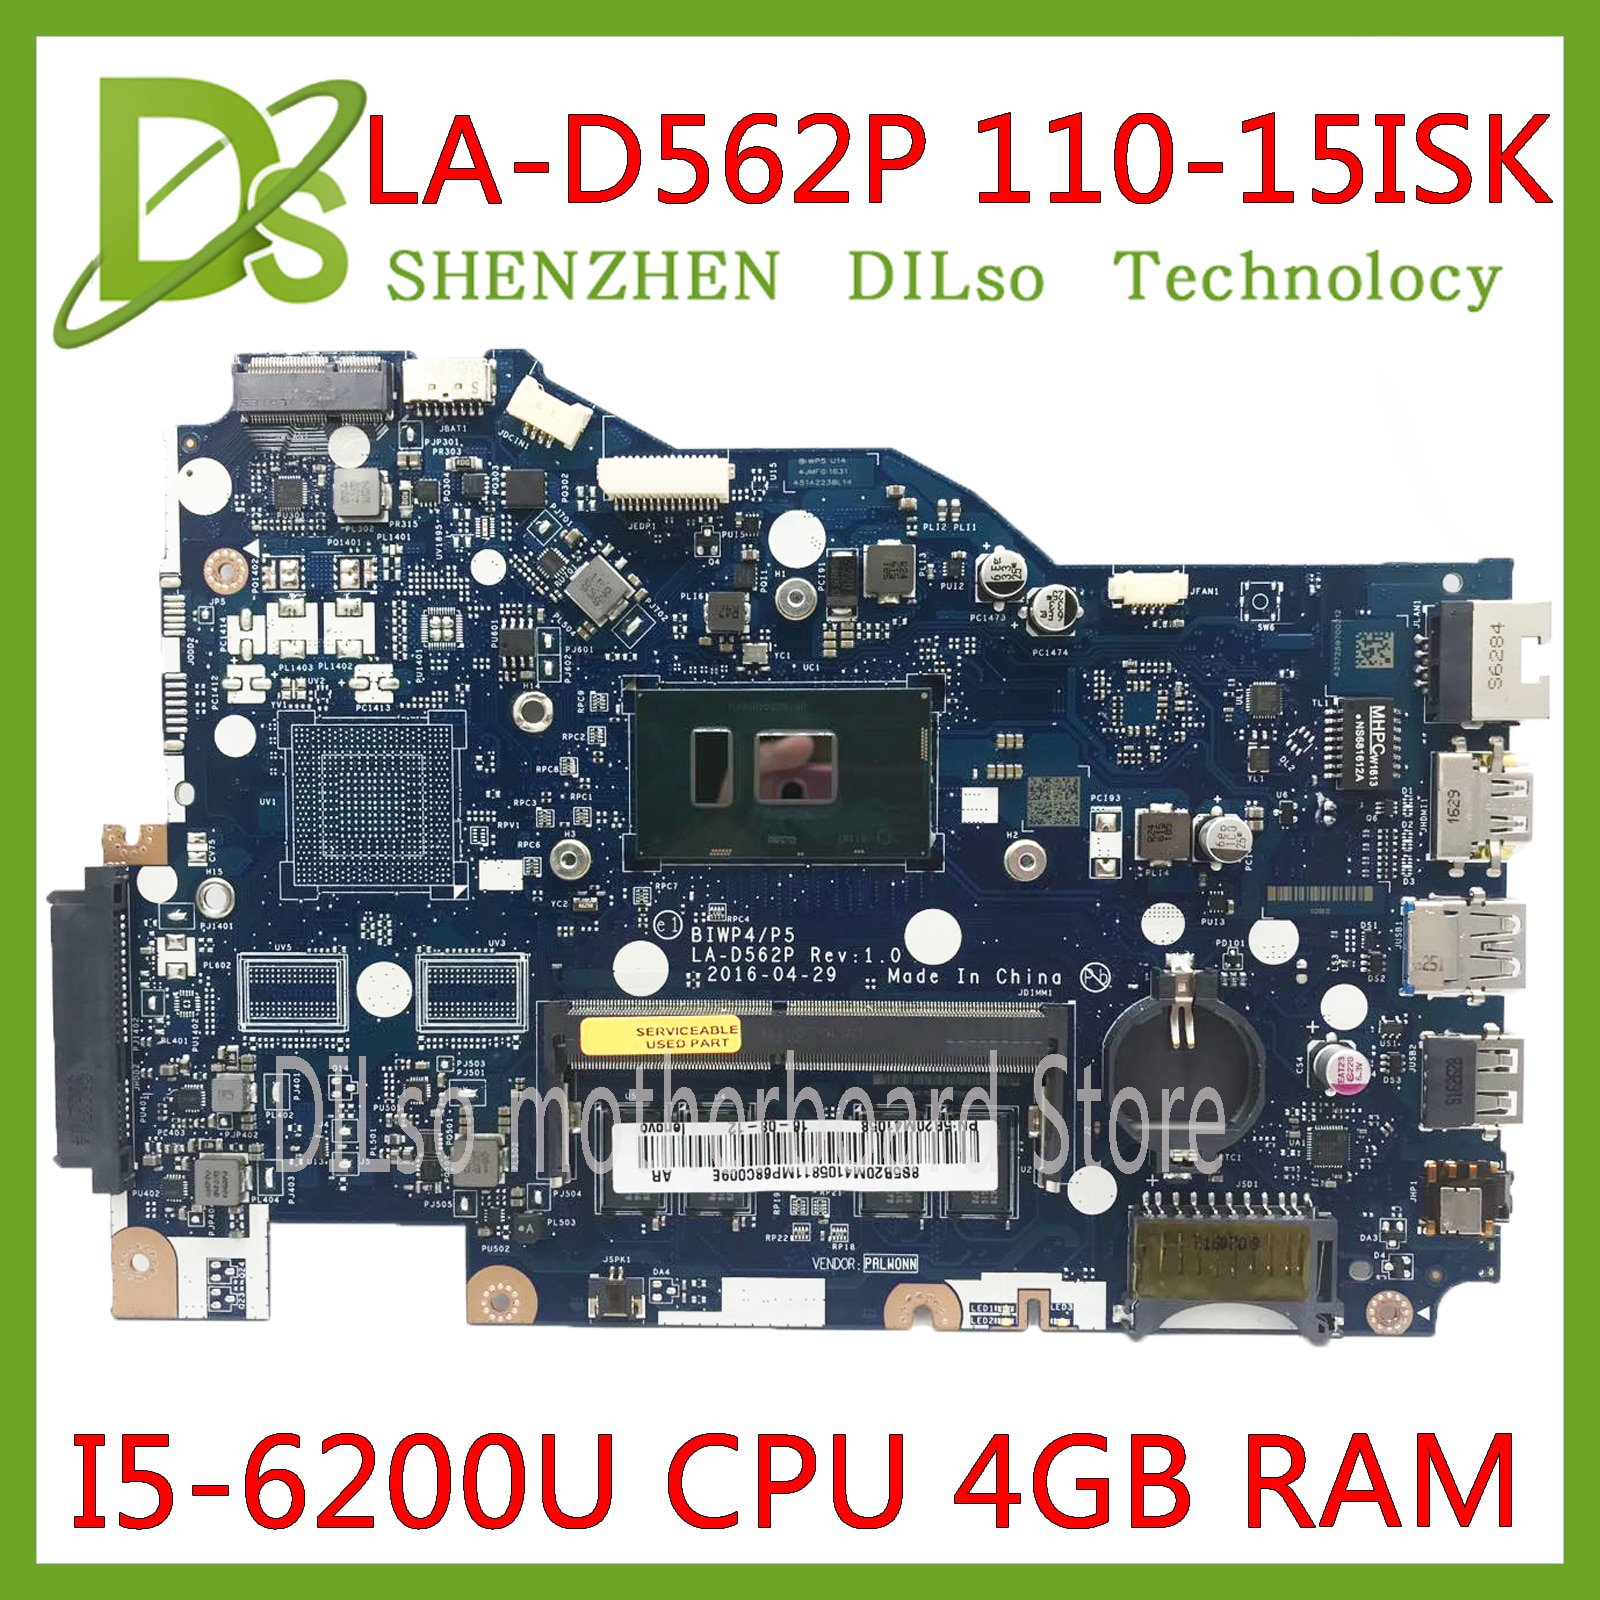 KEFU LA-D562P placa base para Lenovo 110-15isk placa base de computadora portátil LA-D562P I5-6200u CPU 4GB prueba de trabajo 100% original